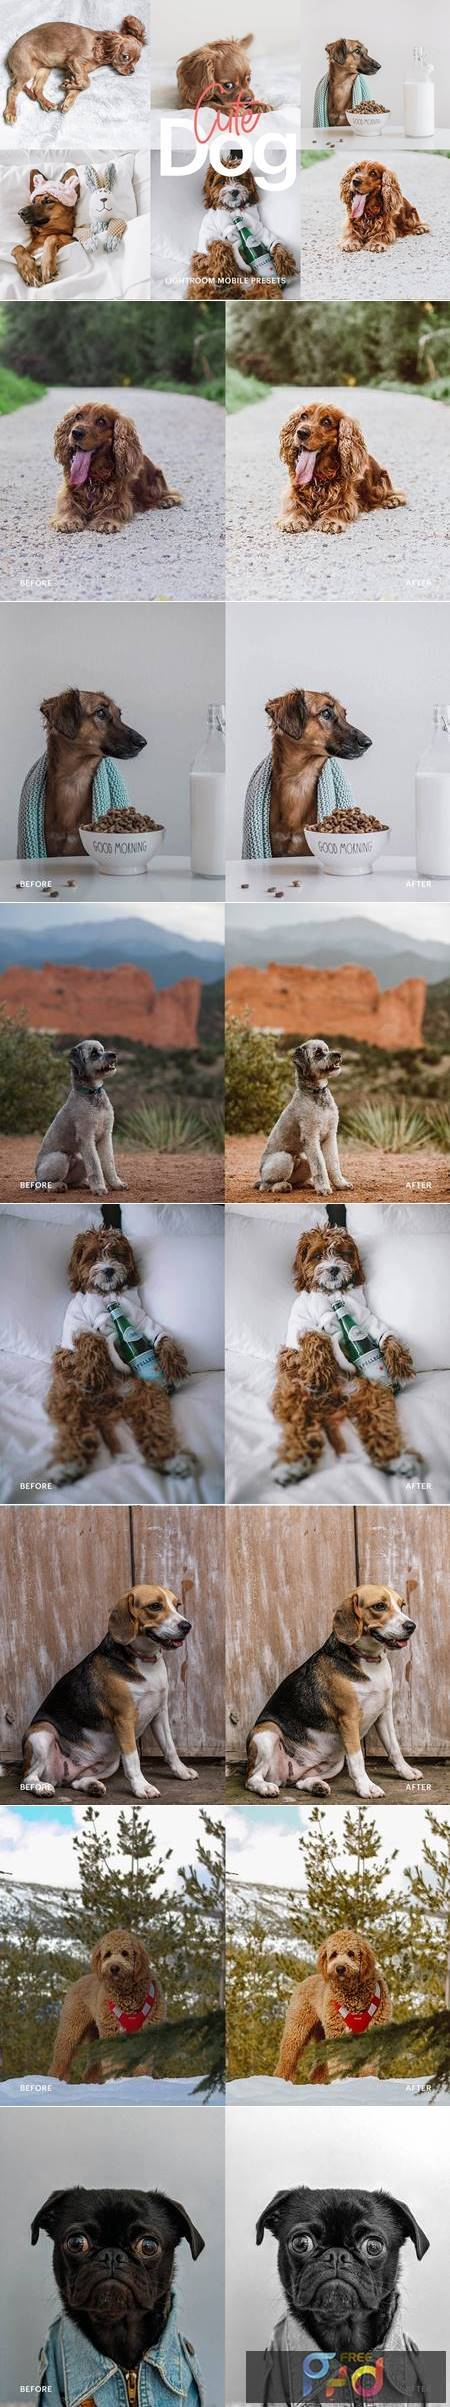 Lightroom Preset-Cute Dog Theme 4972692 1